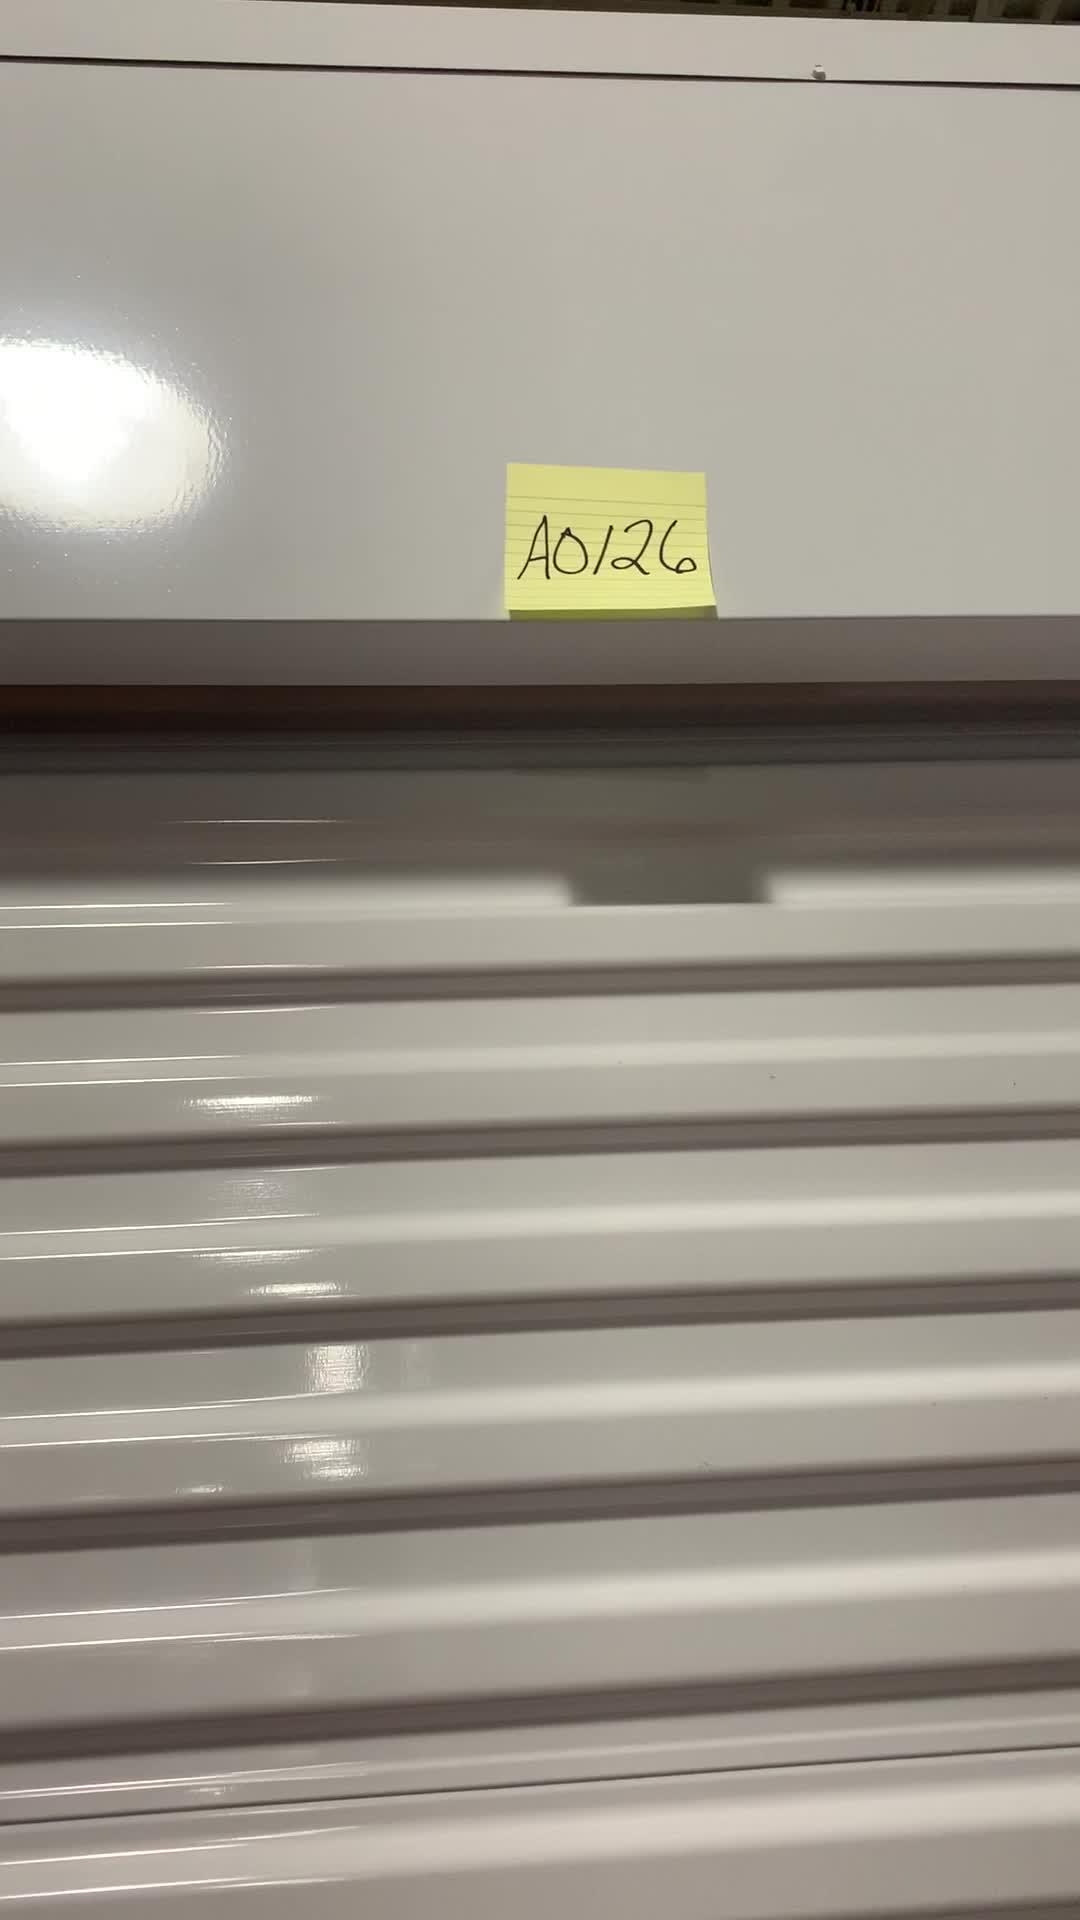 Unit A0126 Bid13